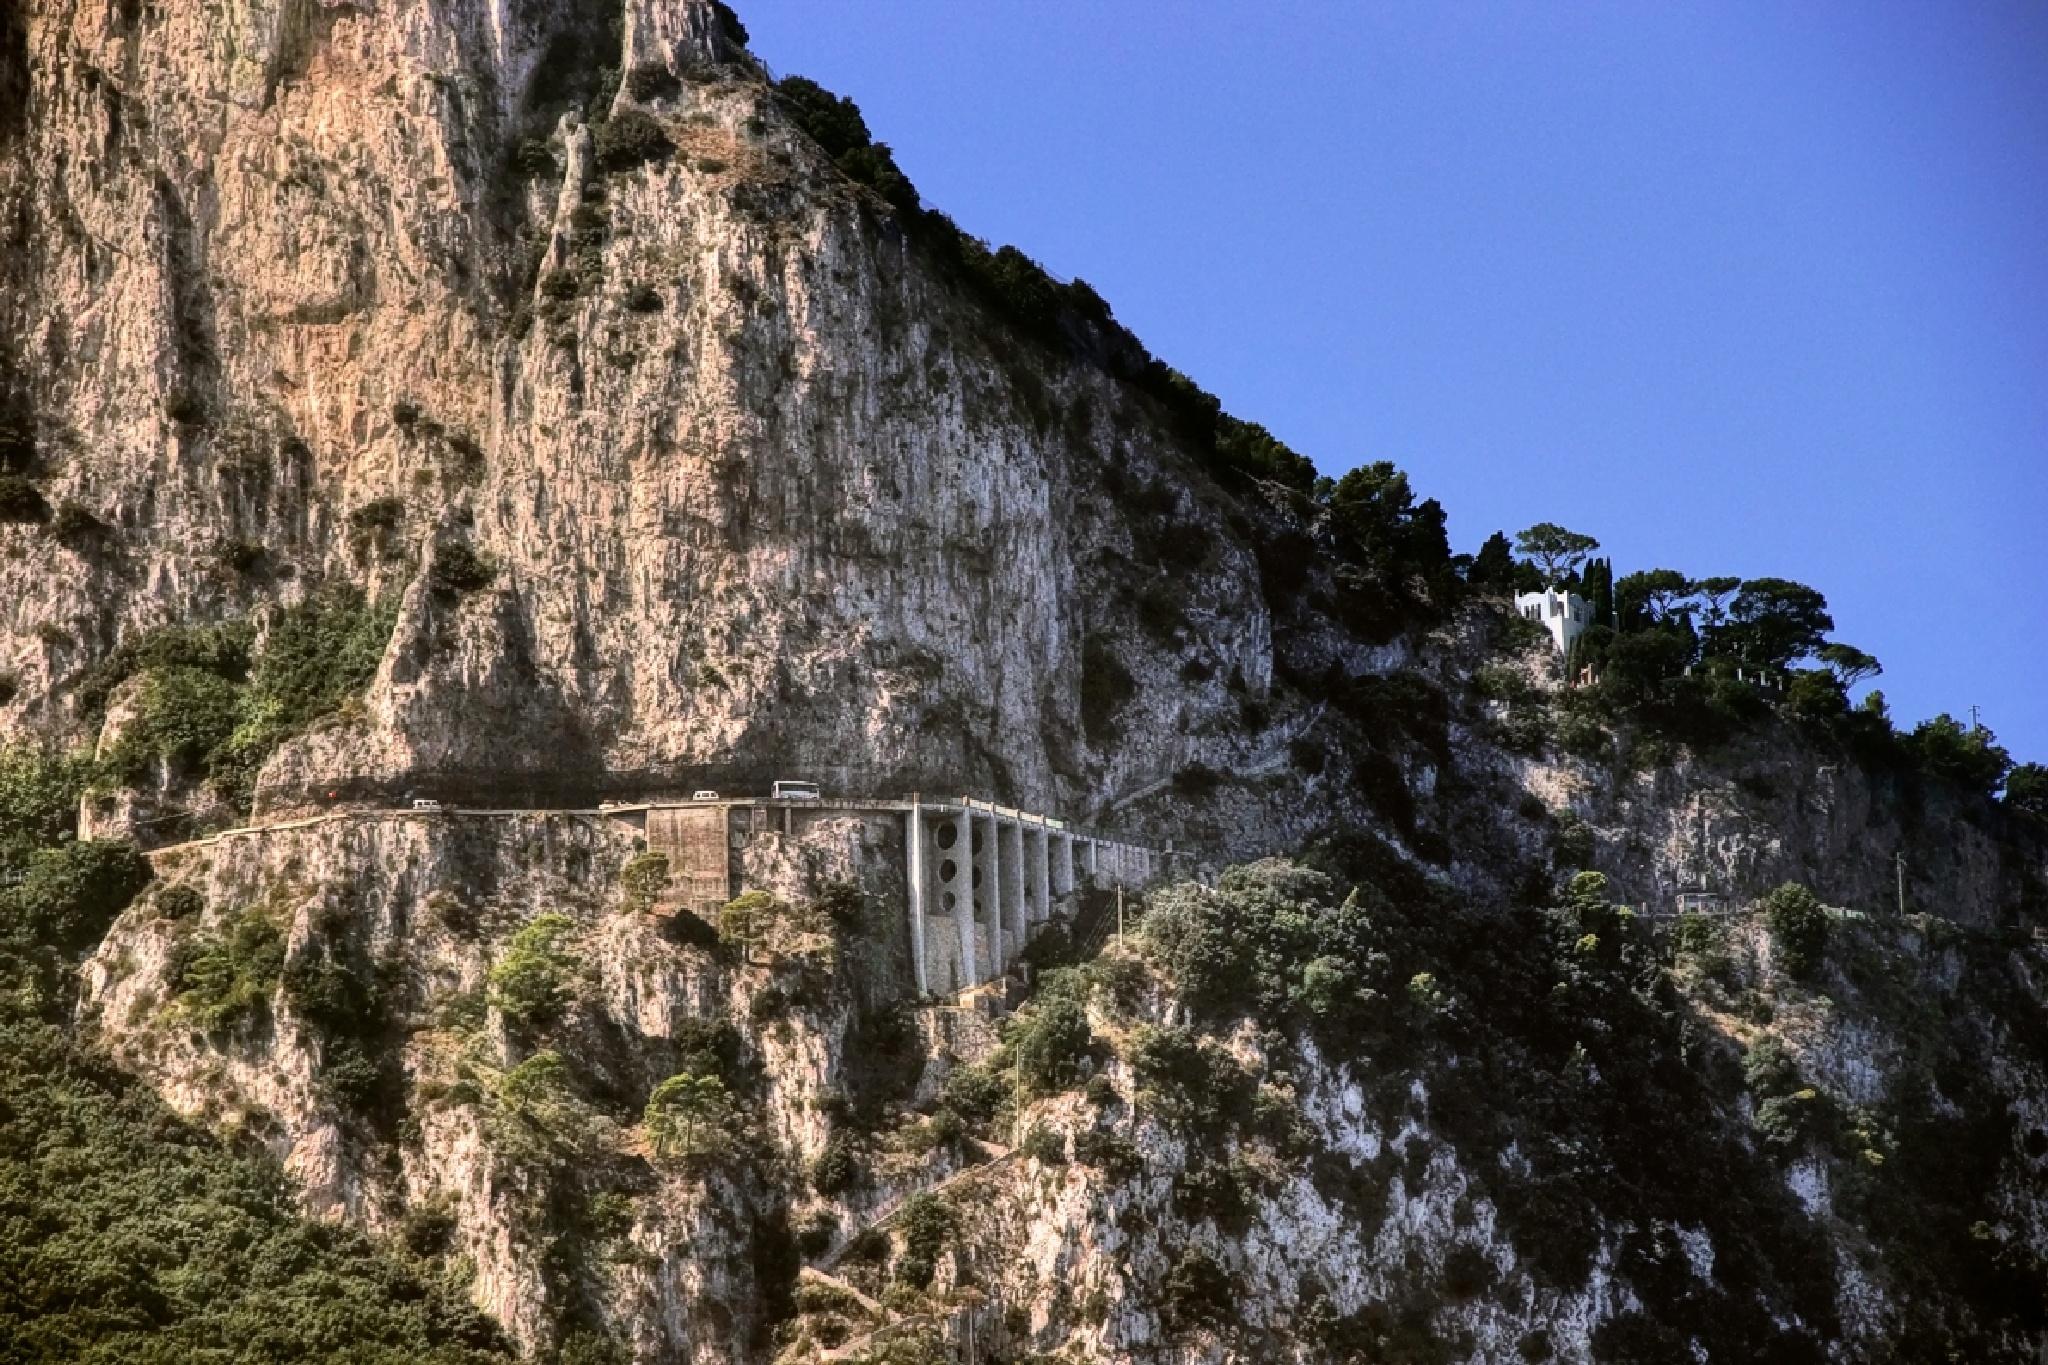 Stone Road by Edu Vergara